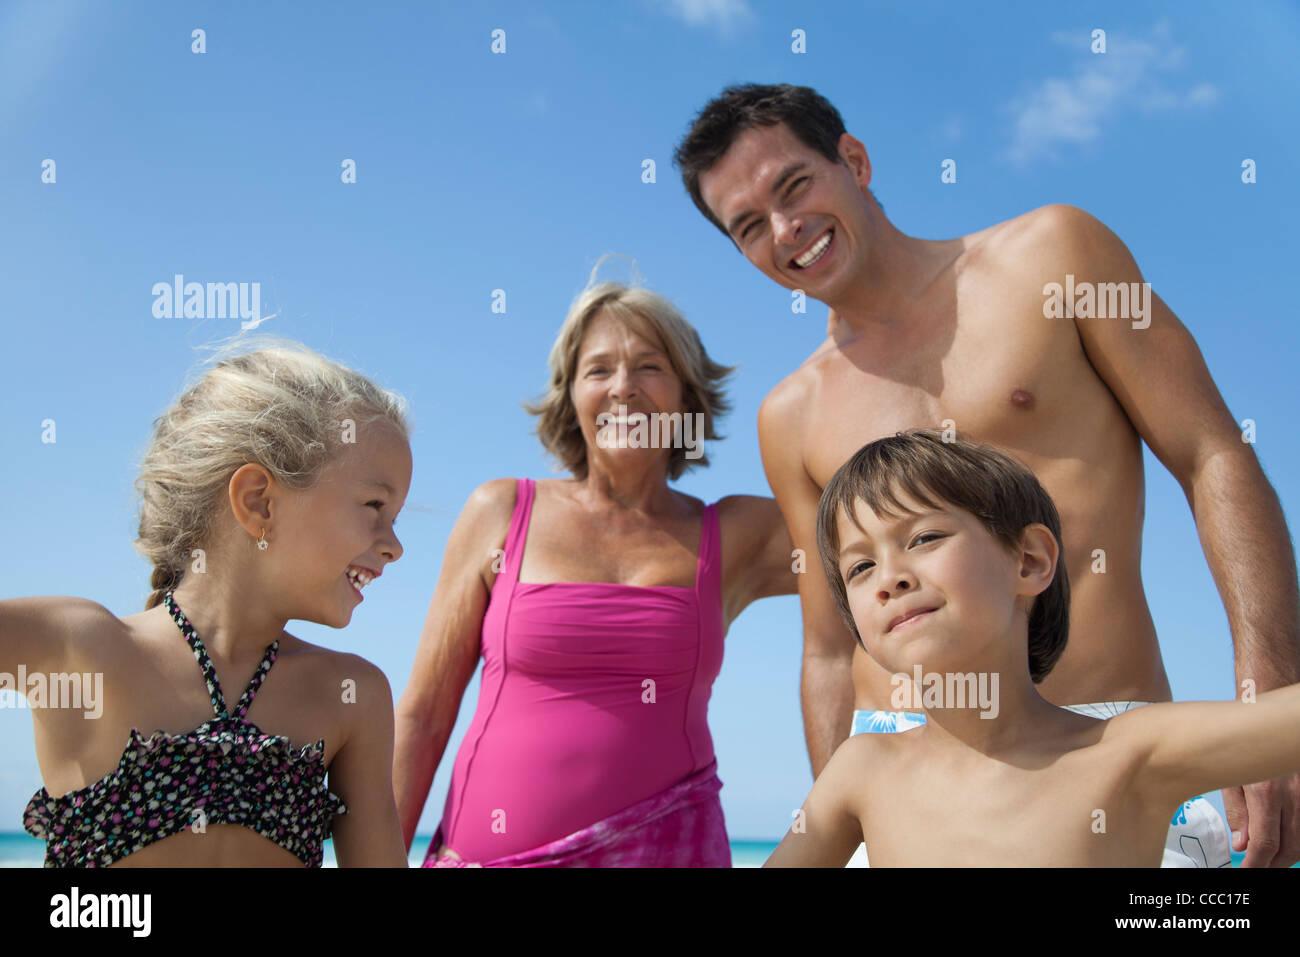 Multi-generation family having fun at the beach Photo Stock